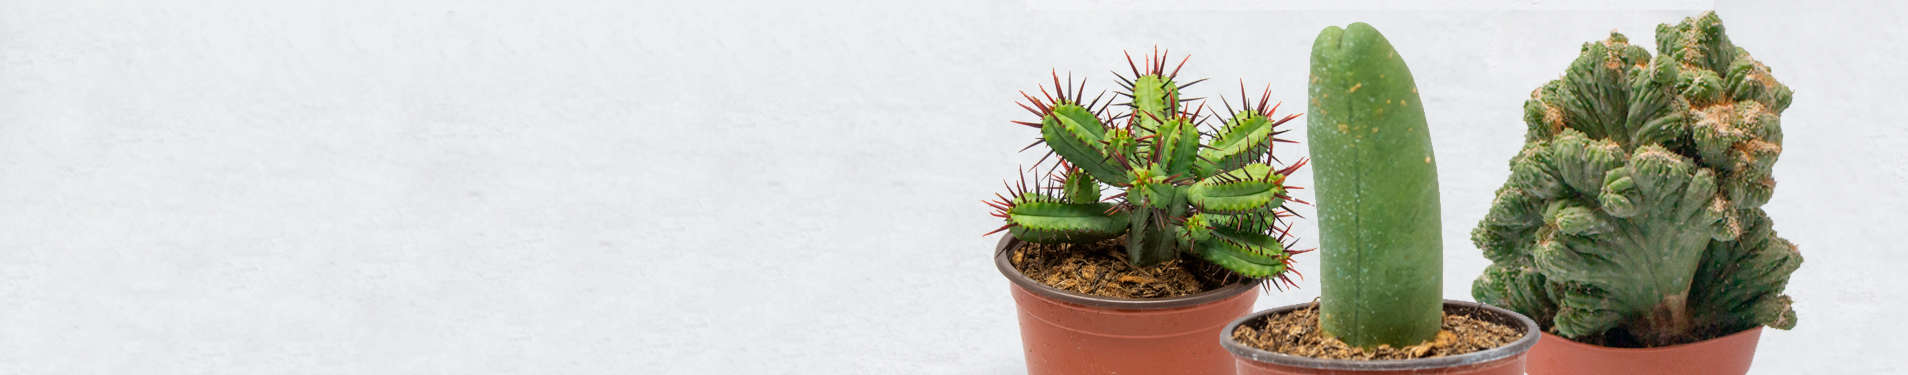 Comprar Cactus Raros Onlines